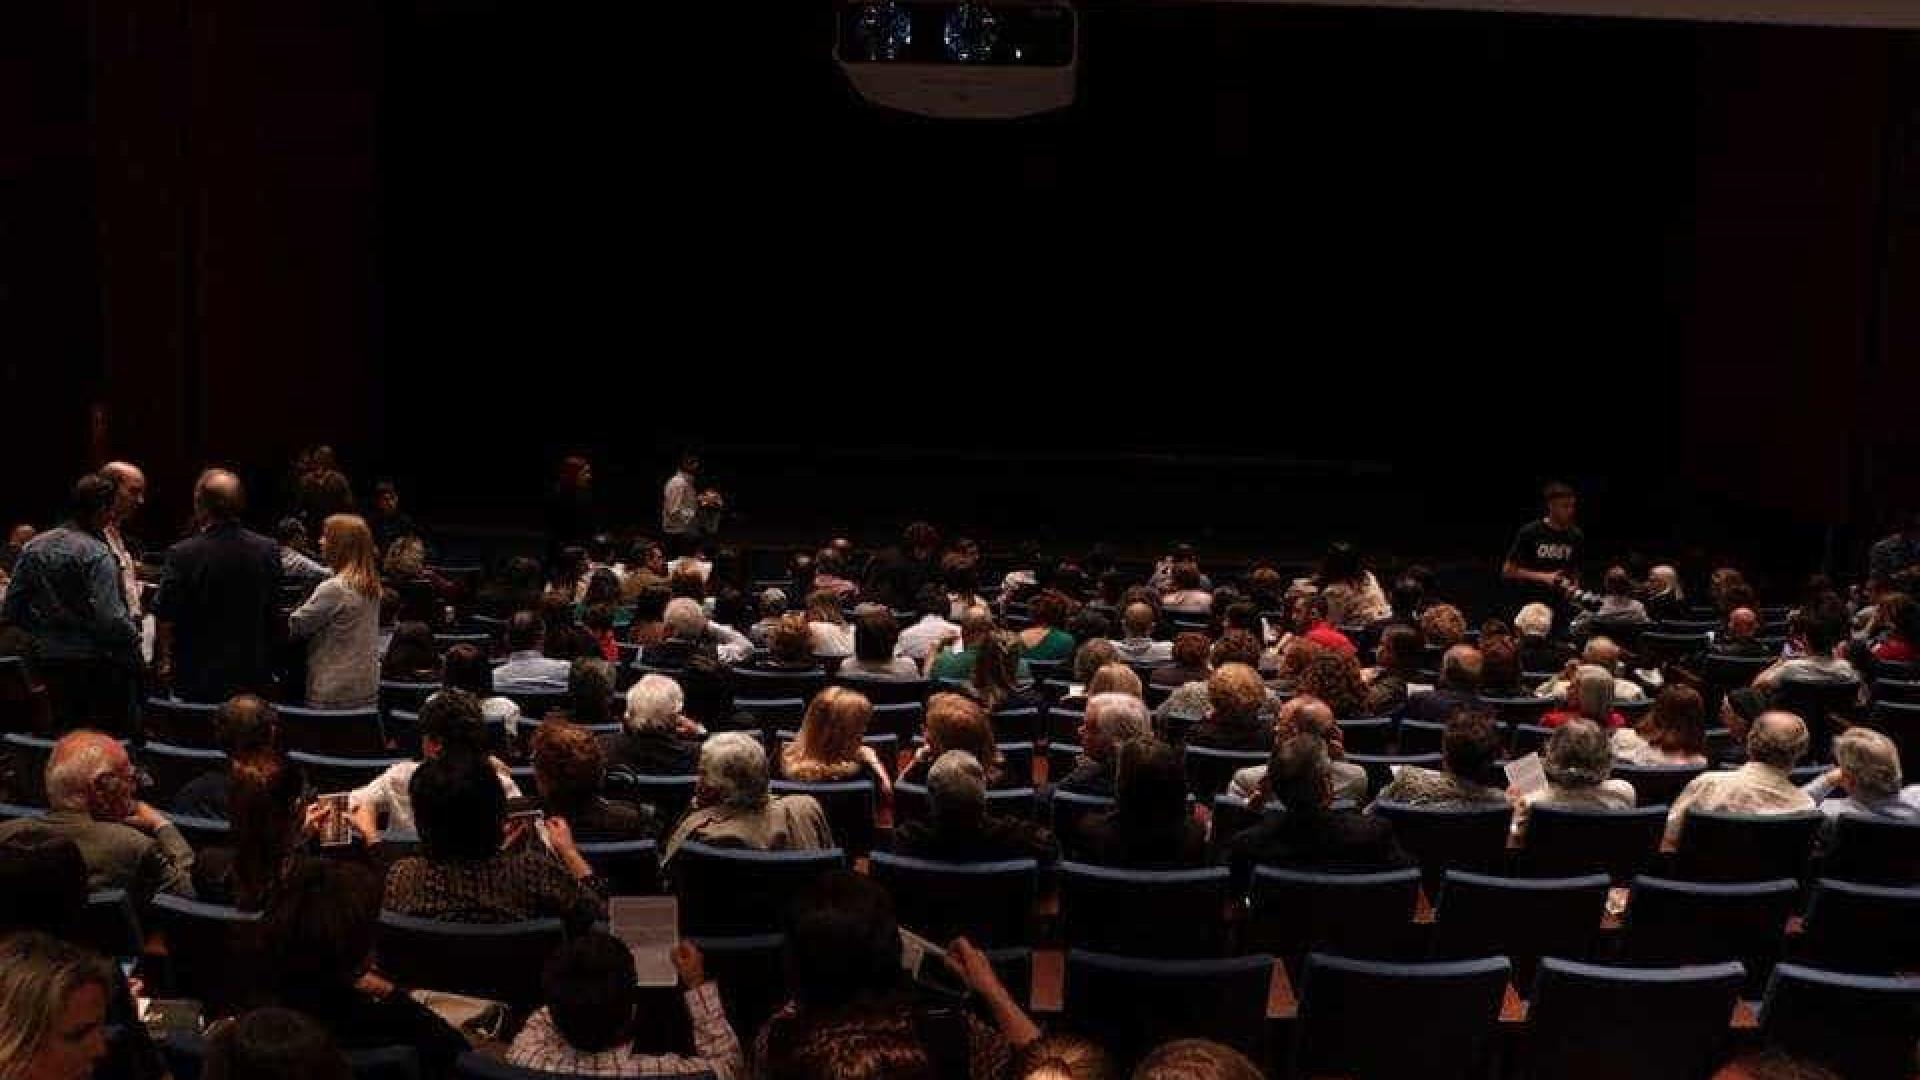 Teatro Académico de Gil Vicente aposta no teatro e cinema